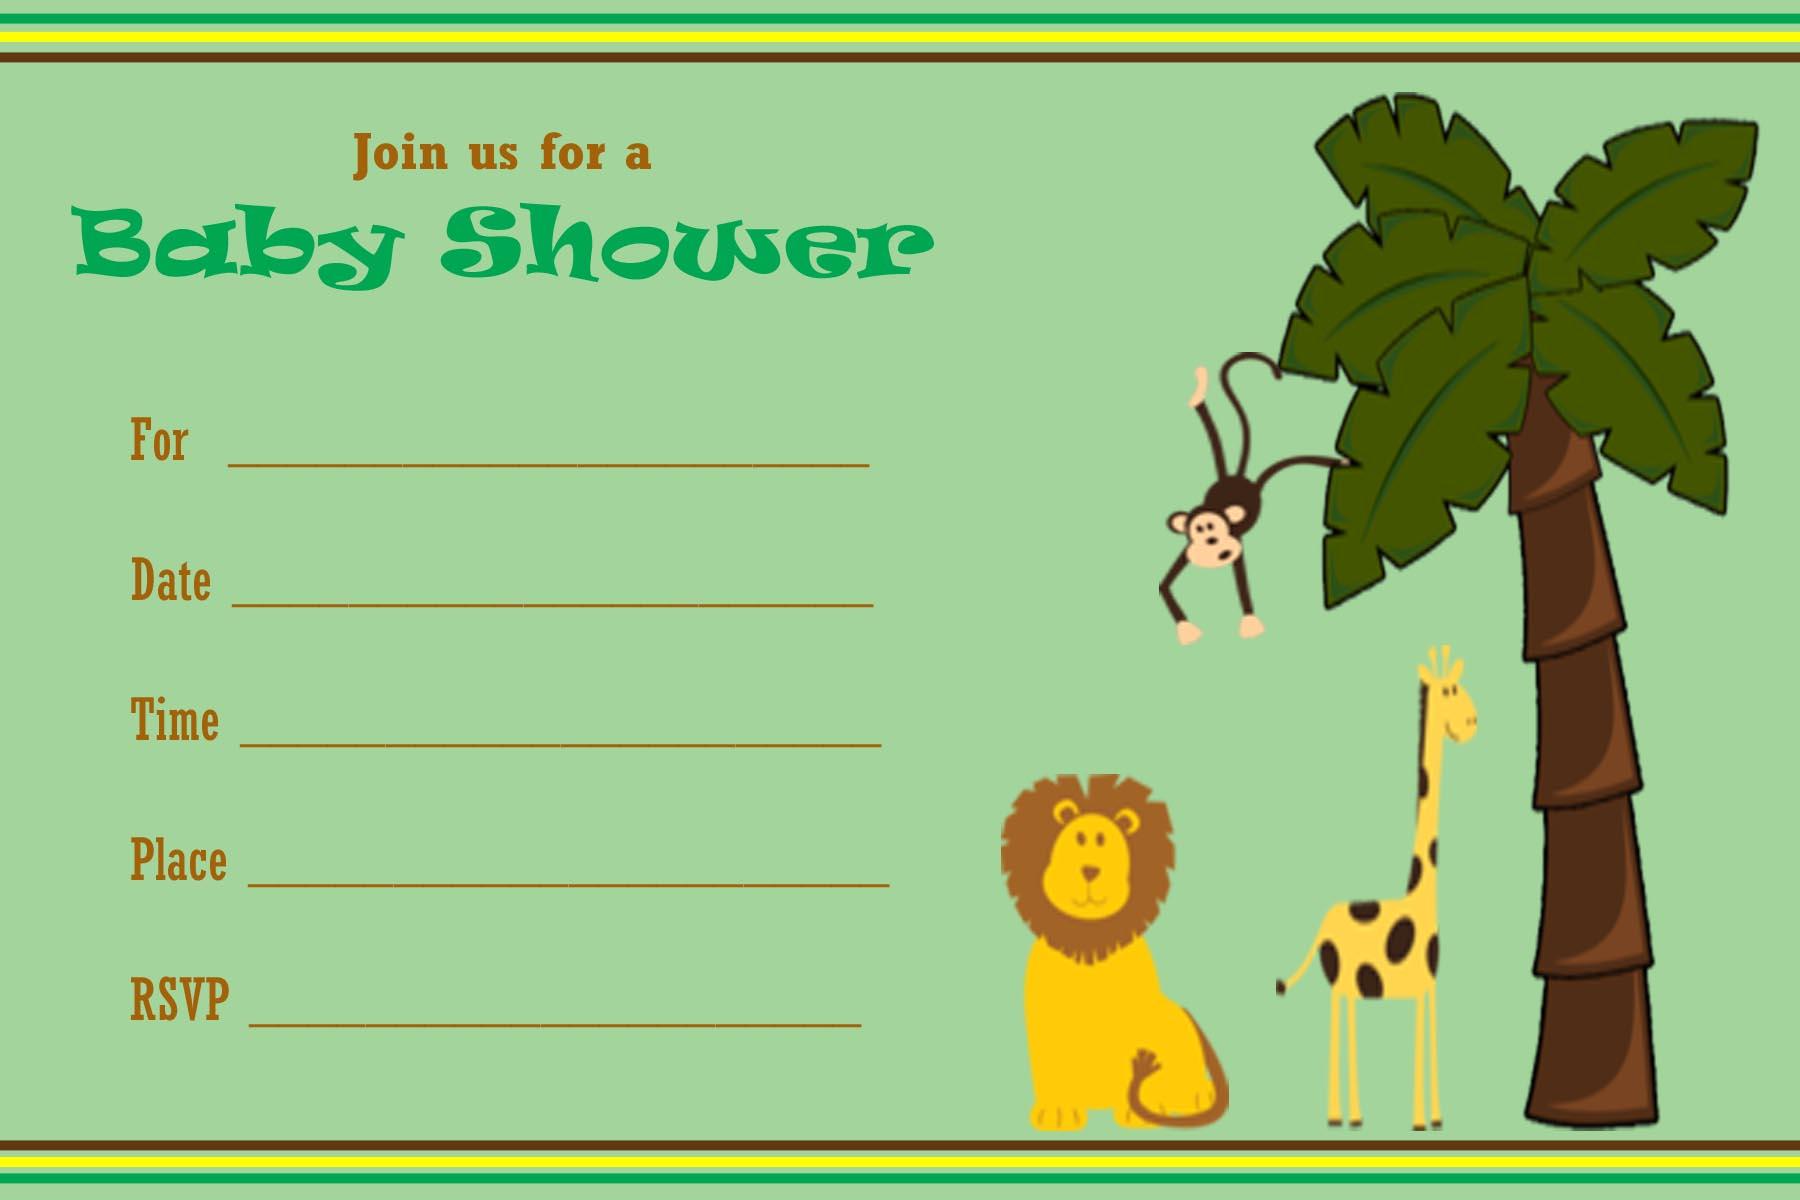 30 New Pics Jungle Baby Shower Invitations - Baby Shower Ideas - Free Printable Jungle Safari Baby Shower Invitations